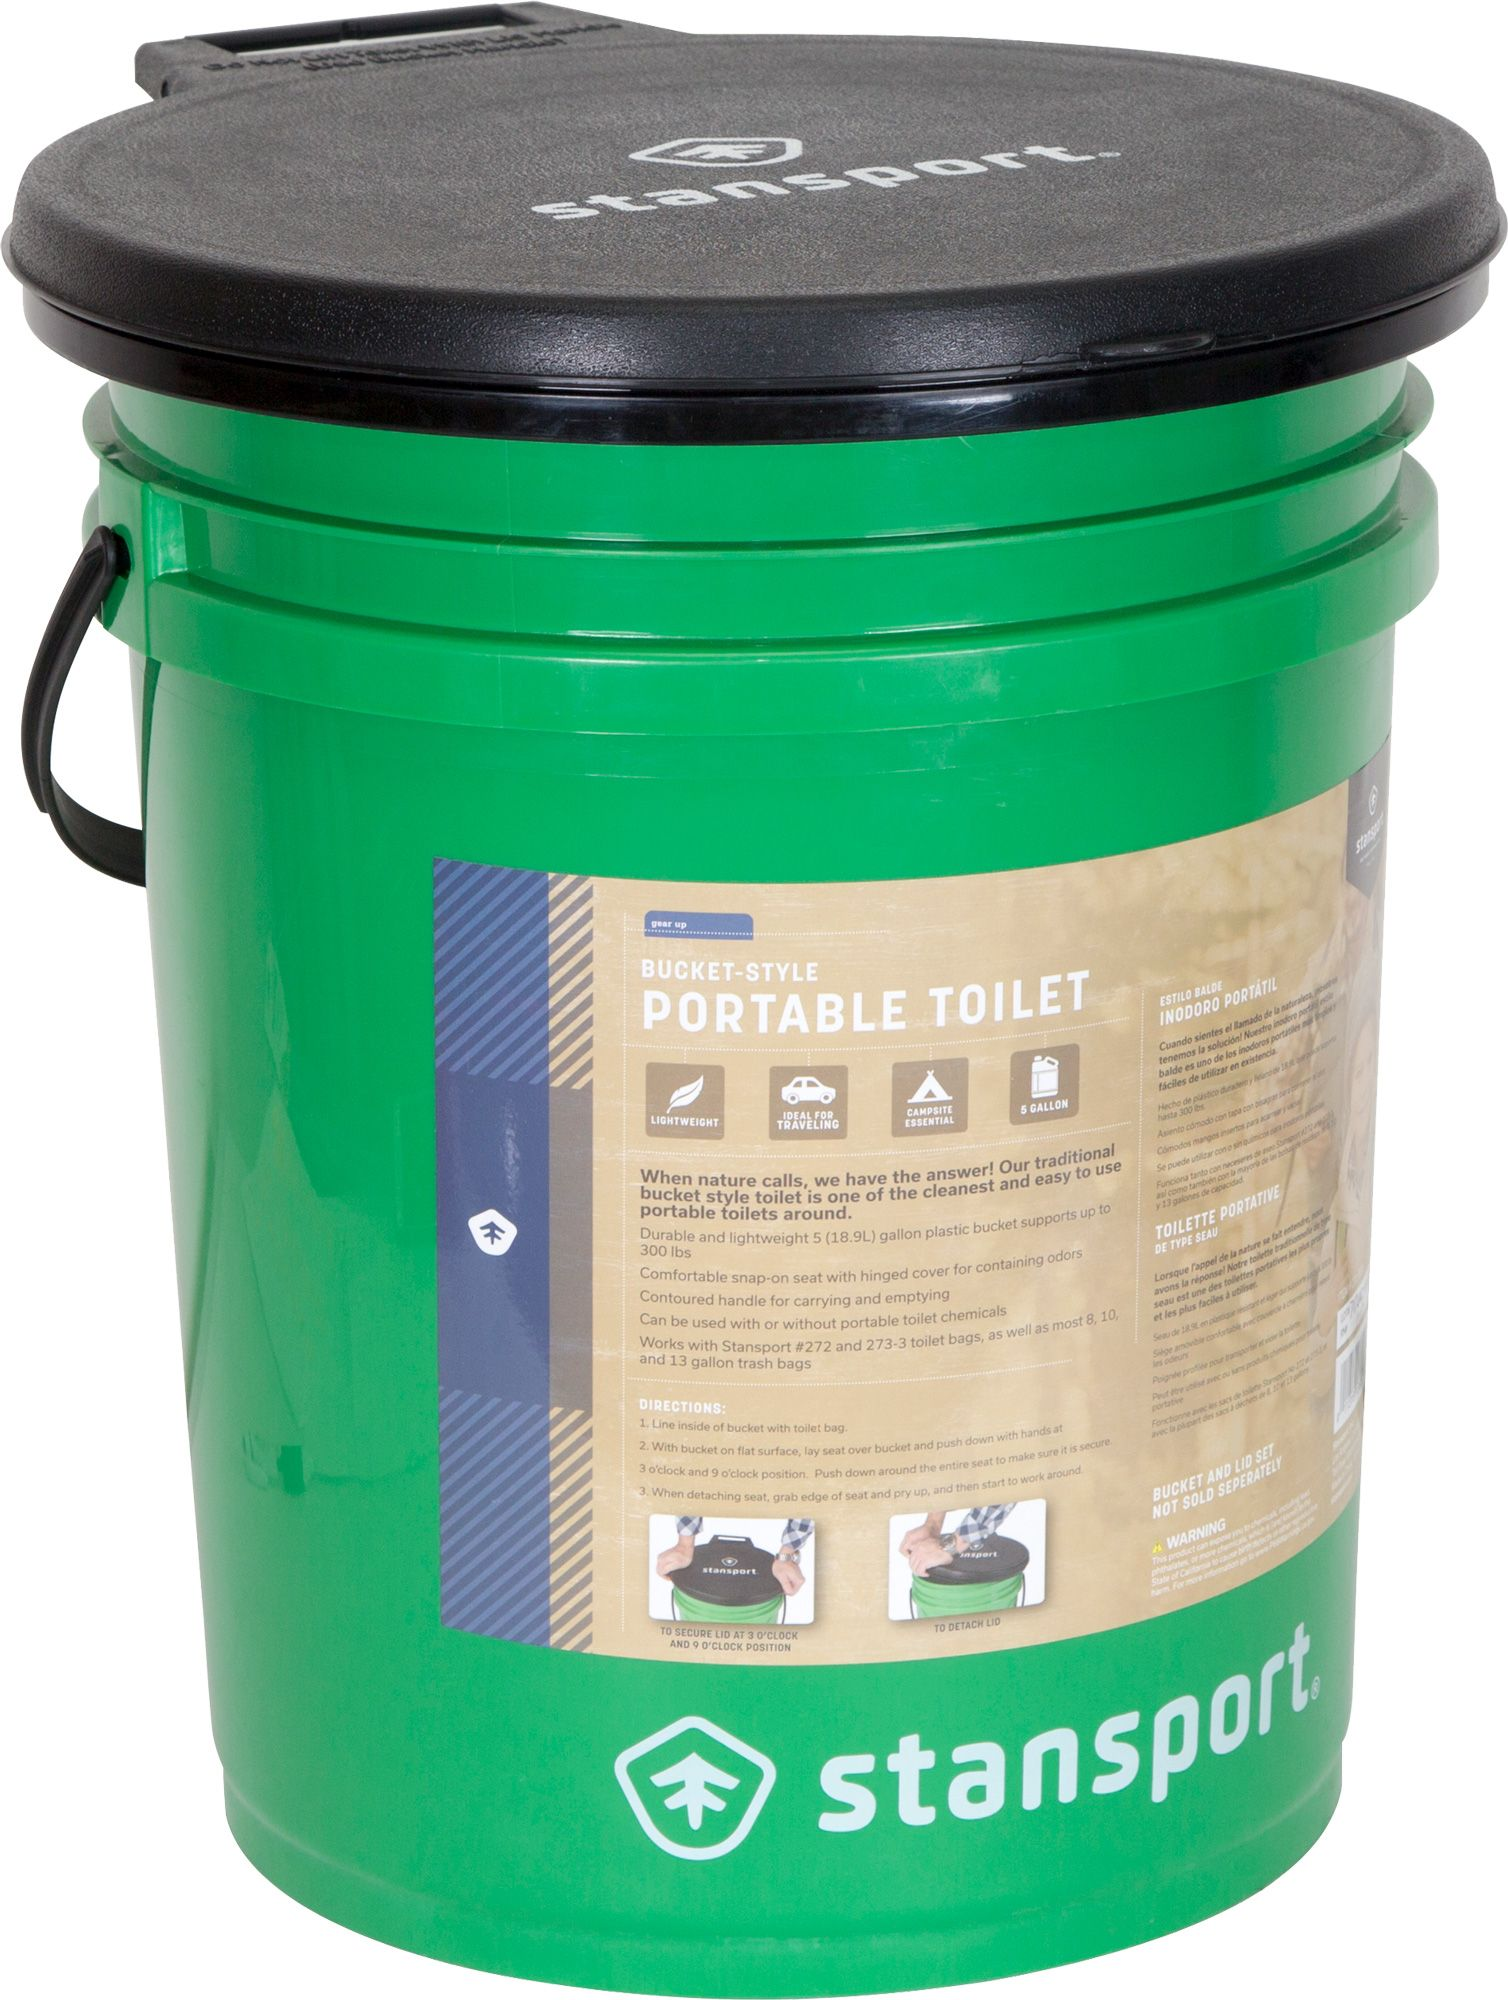 Merveilleux Stansport Bucket Style Portable Toilet